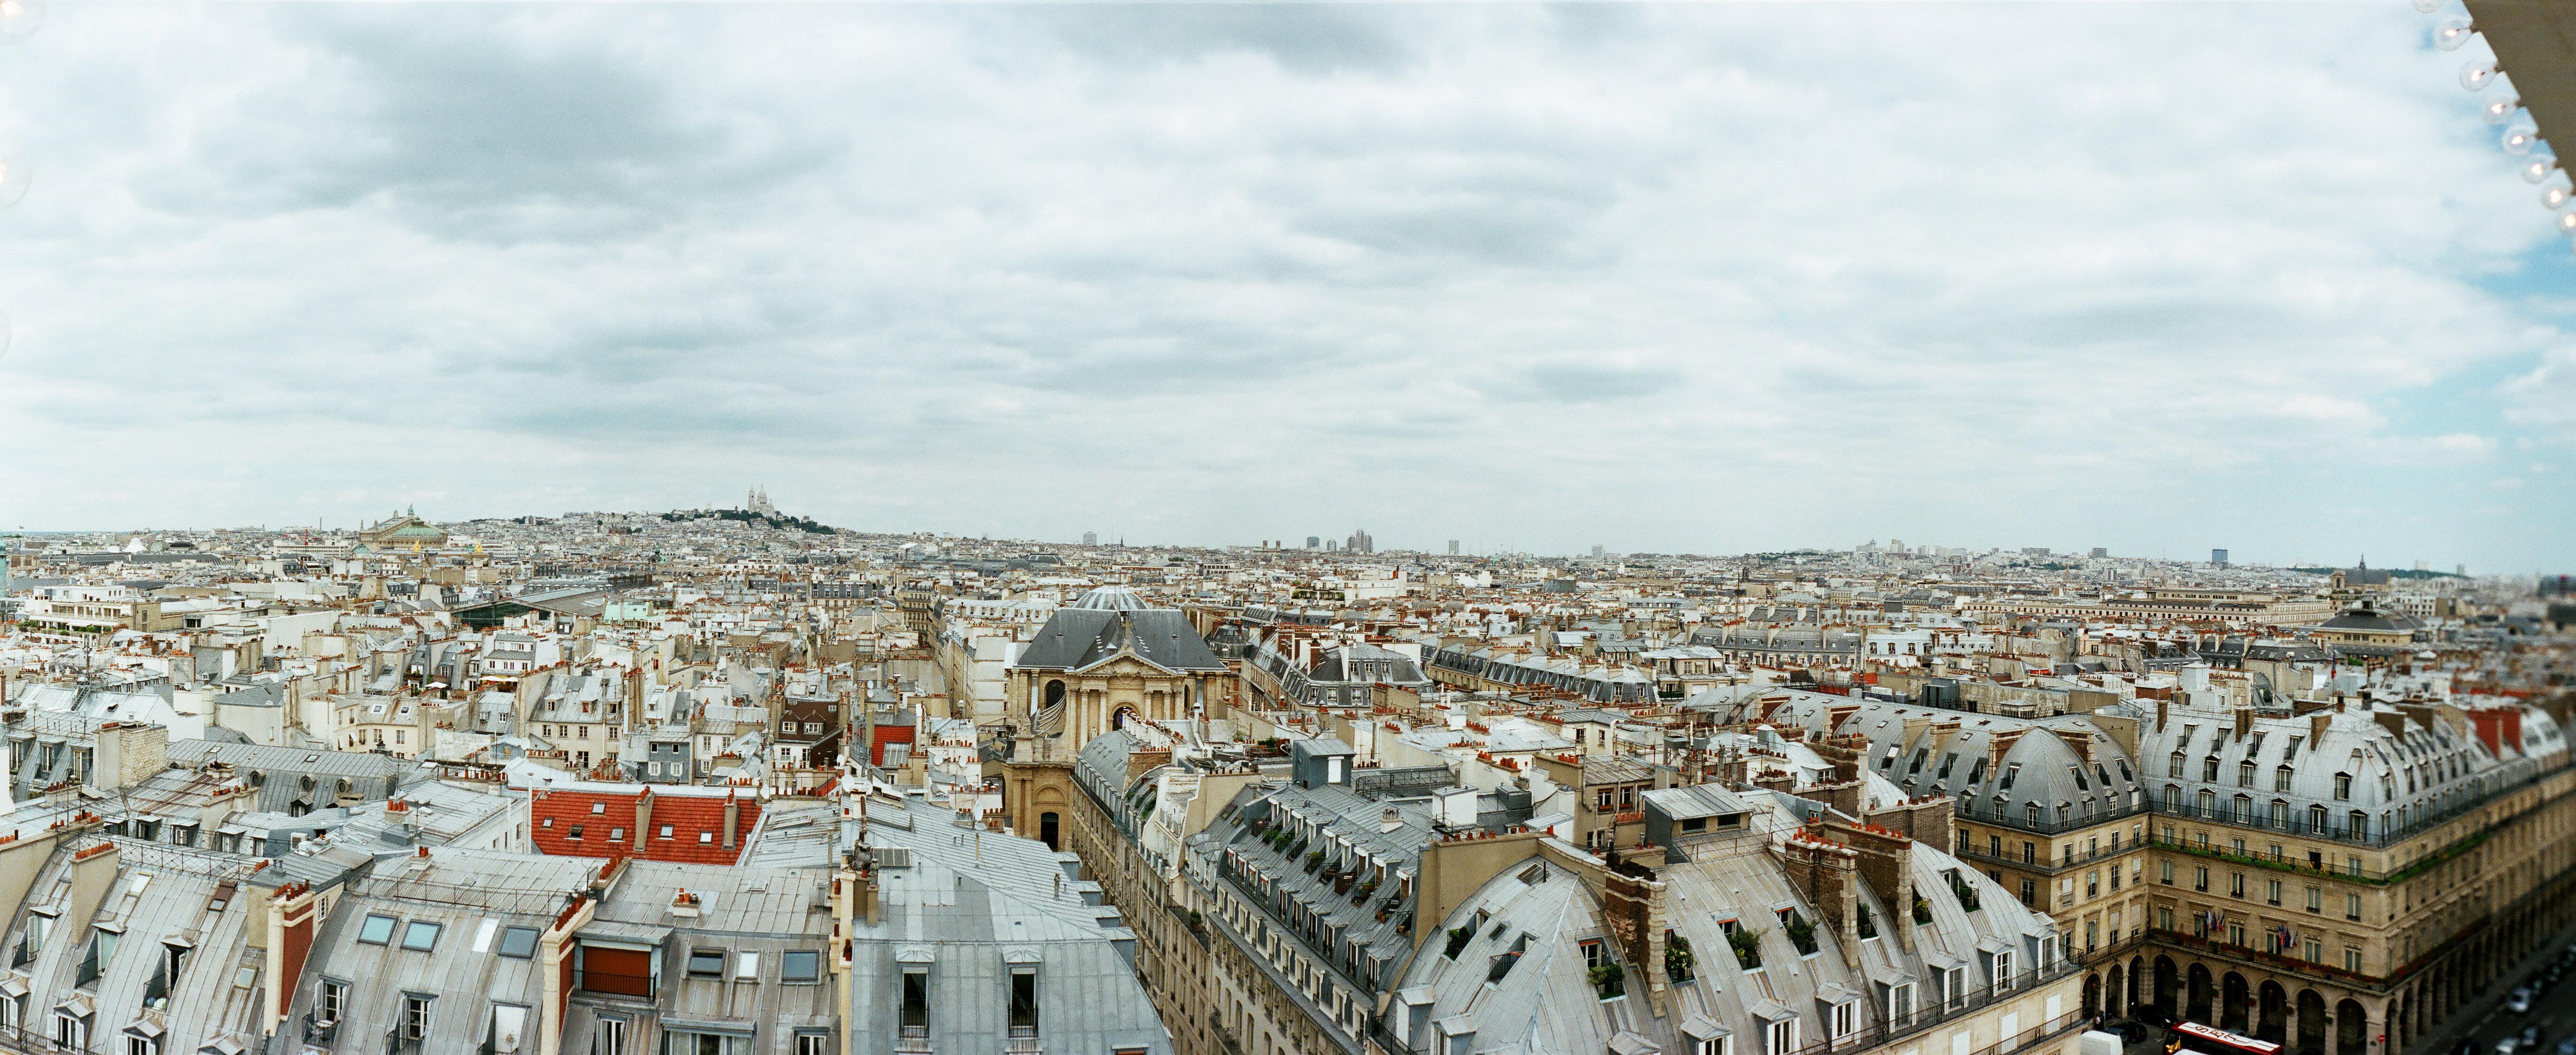 With a view: лучшие виды на Париж